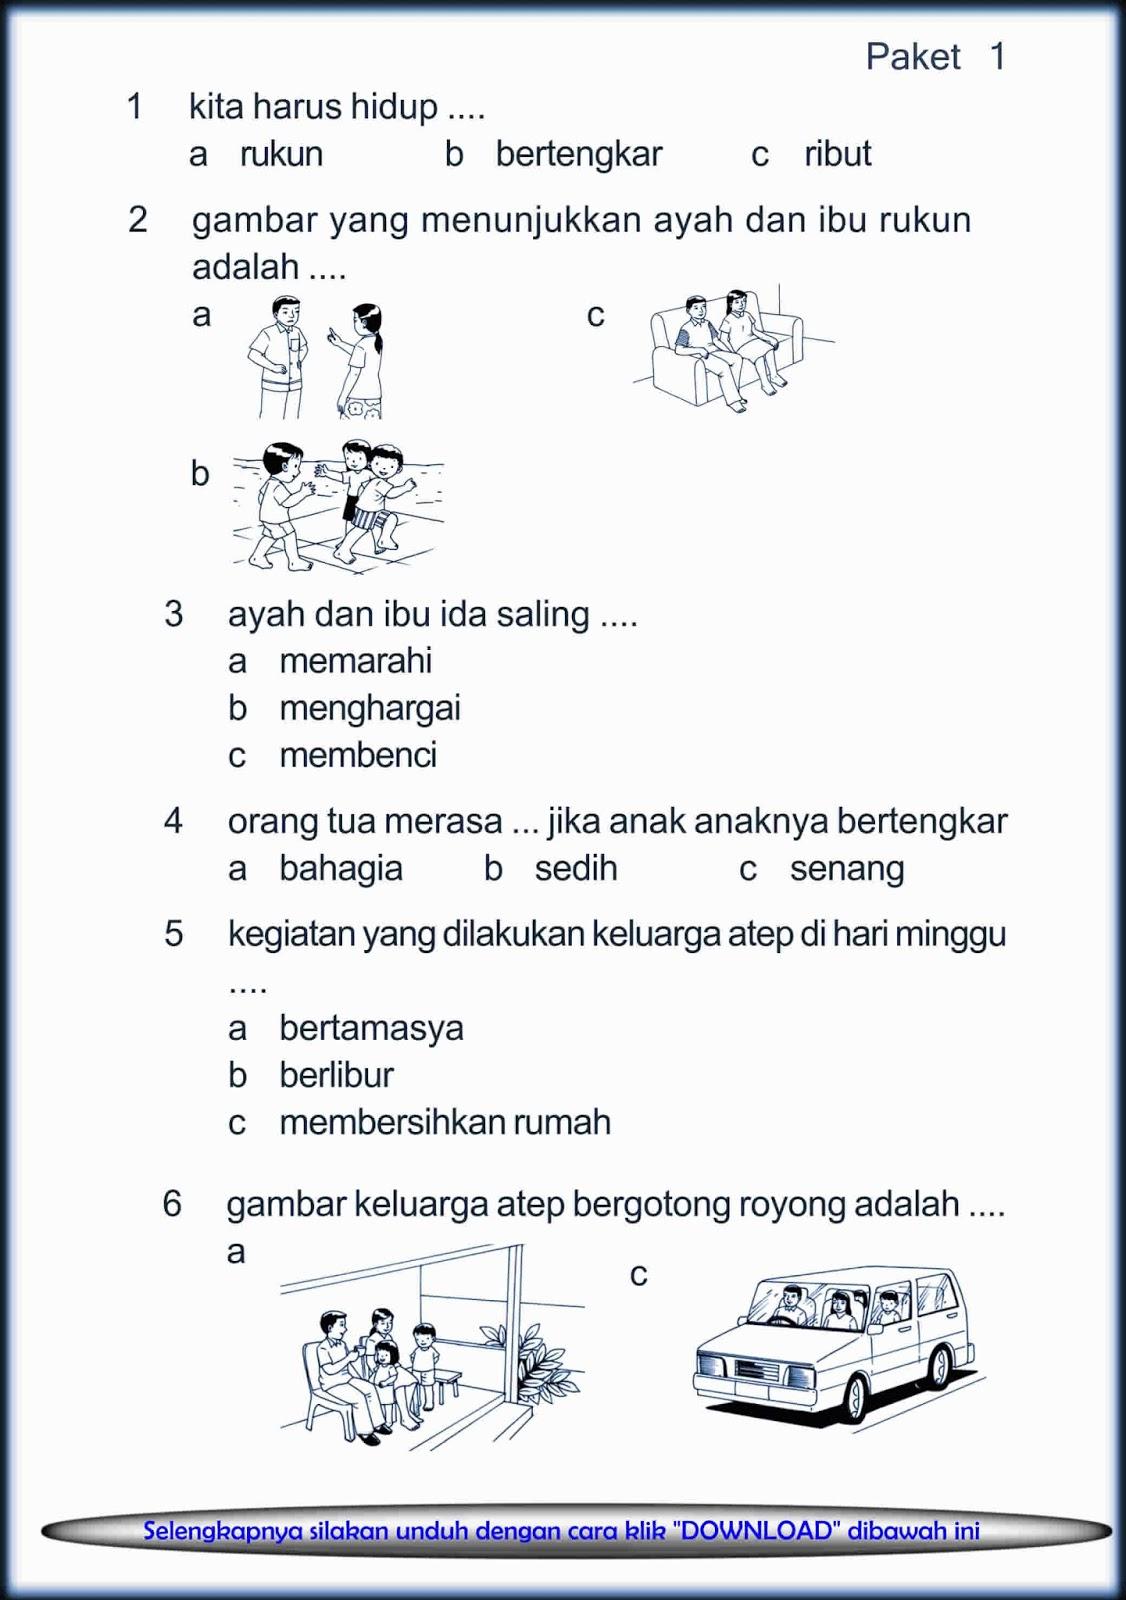 Download Soal Uts Pkn Kelas 1 Semester Ganjil 2015 2016 Rief Awa Blog Download Kumpulan